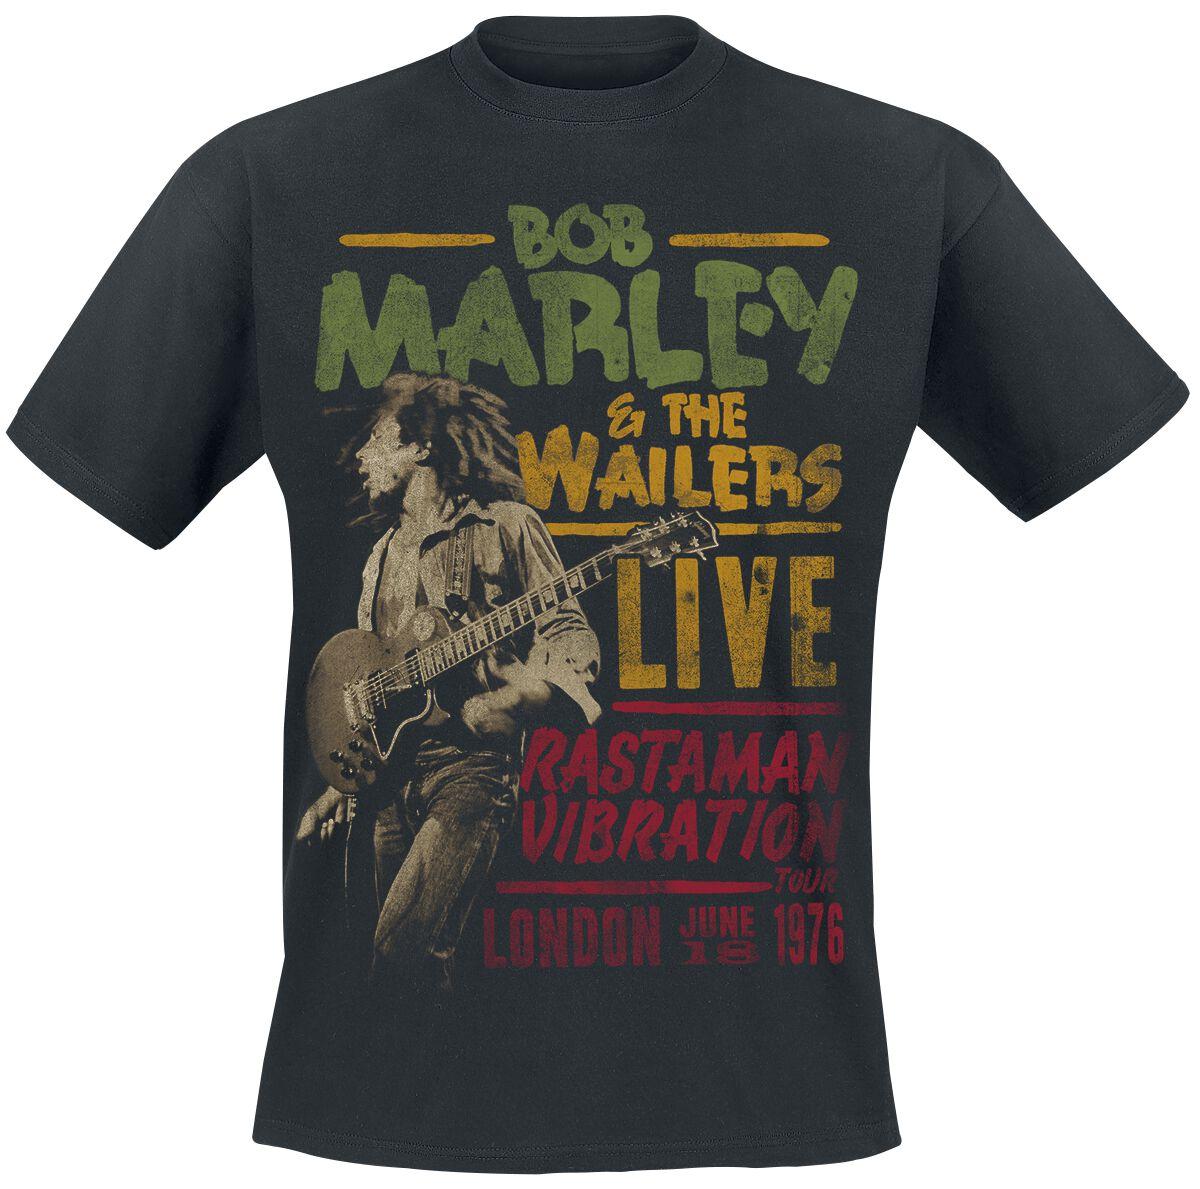 Zespoły - Koszulki - T-Shirt Bob Marley Rastaman Live T-Shirt czarny - 376109